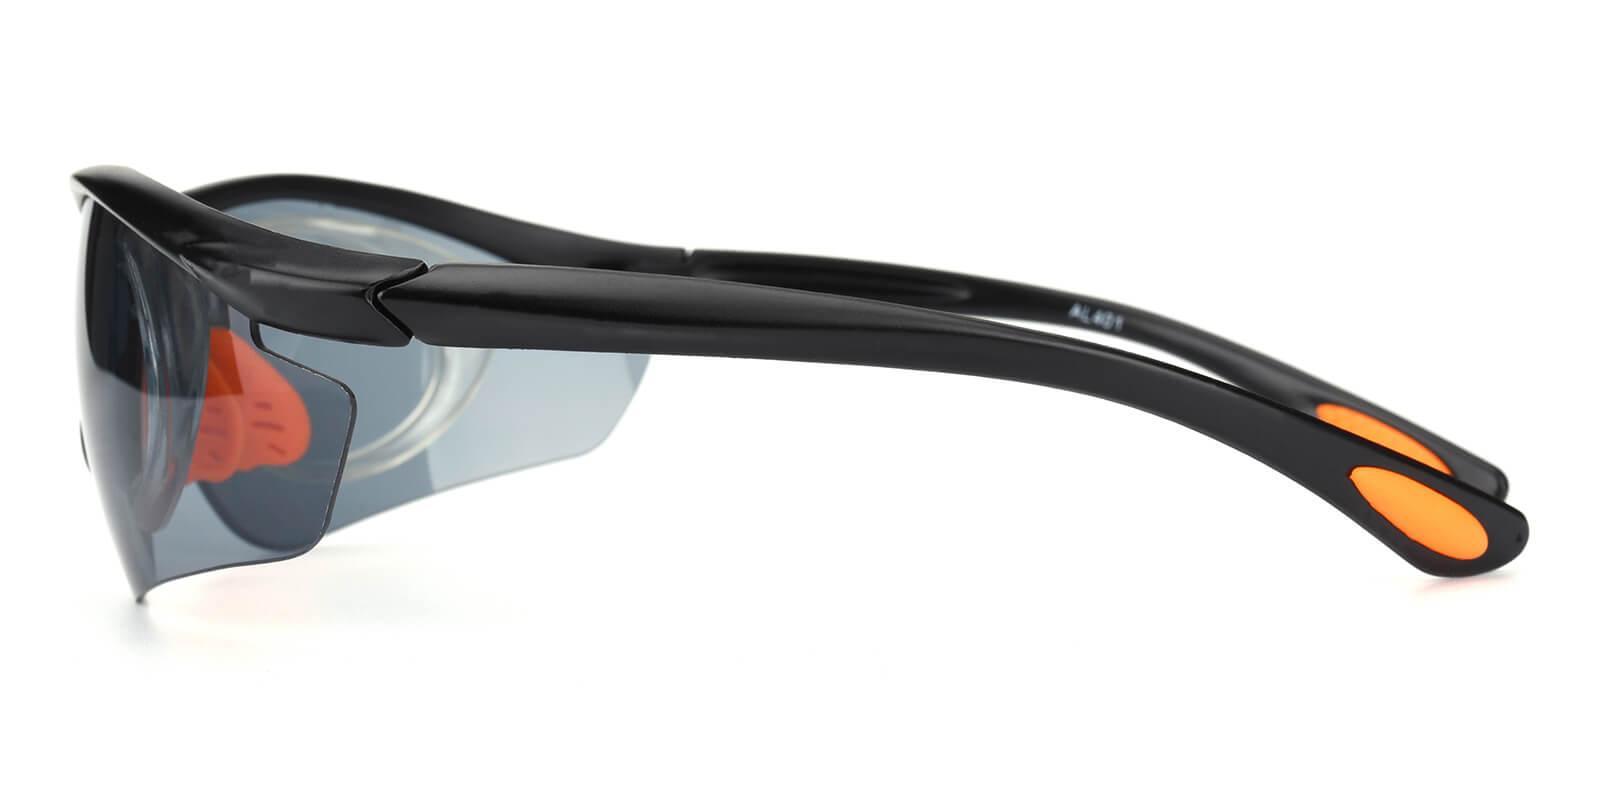 Preavey-Black-Square-Plastic-SportsGlasses-detail